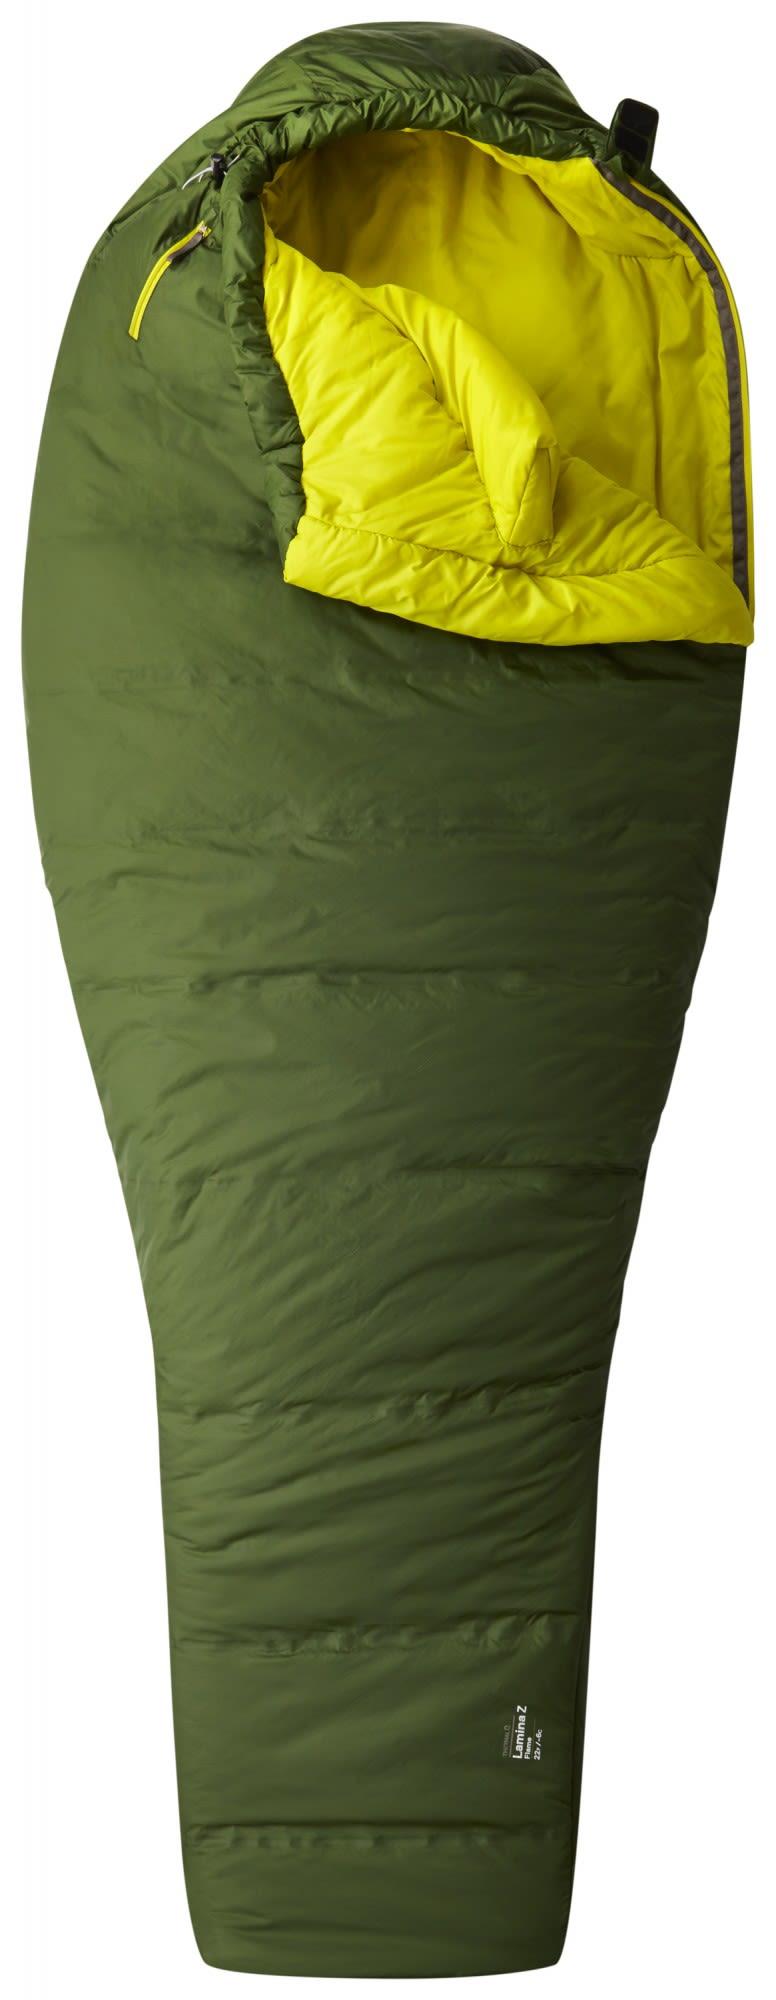 Mountain Hardwear Lamina Z Flame Regular Oliv, Kunstfaserschlafsack, 183 cm -RV